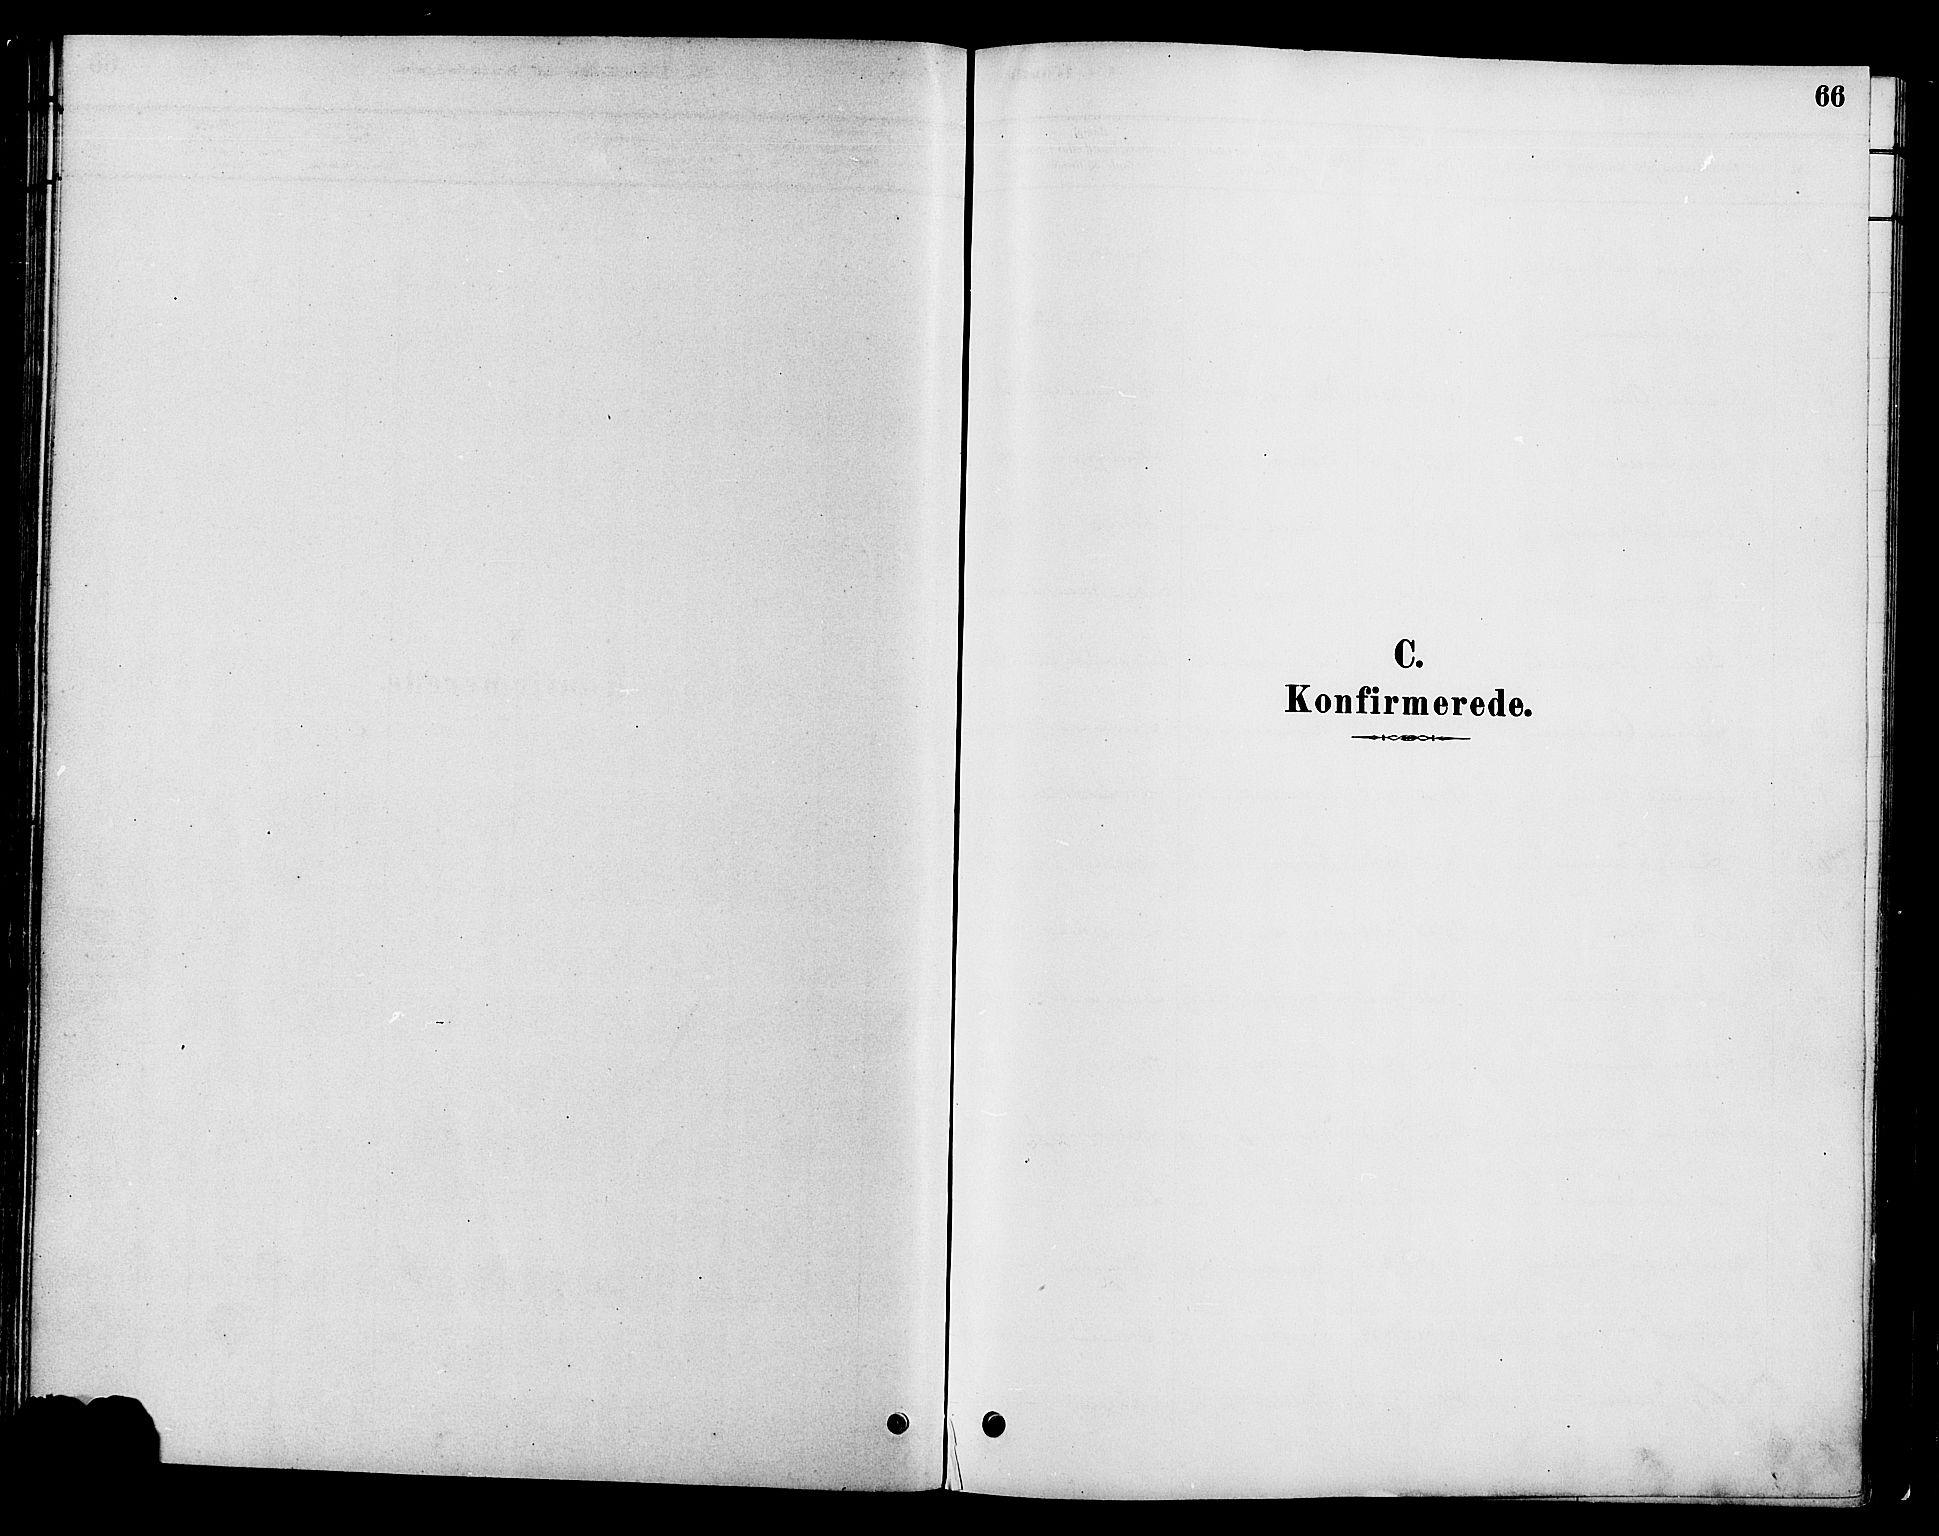 SAH, Gran prestekontor, Ministerialbok nr. 16, 1880-1888, s. 66